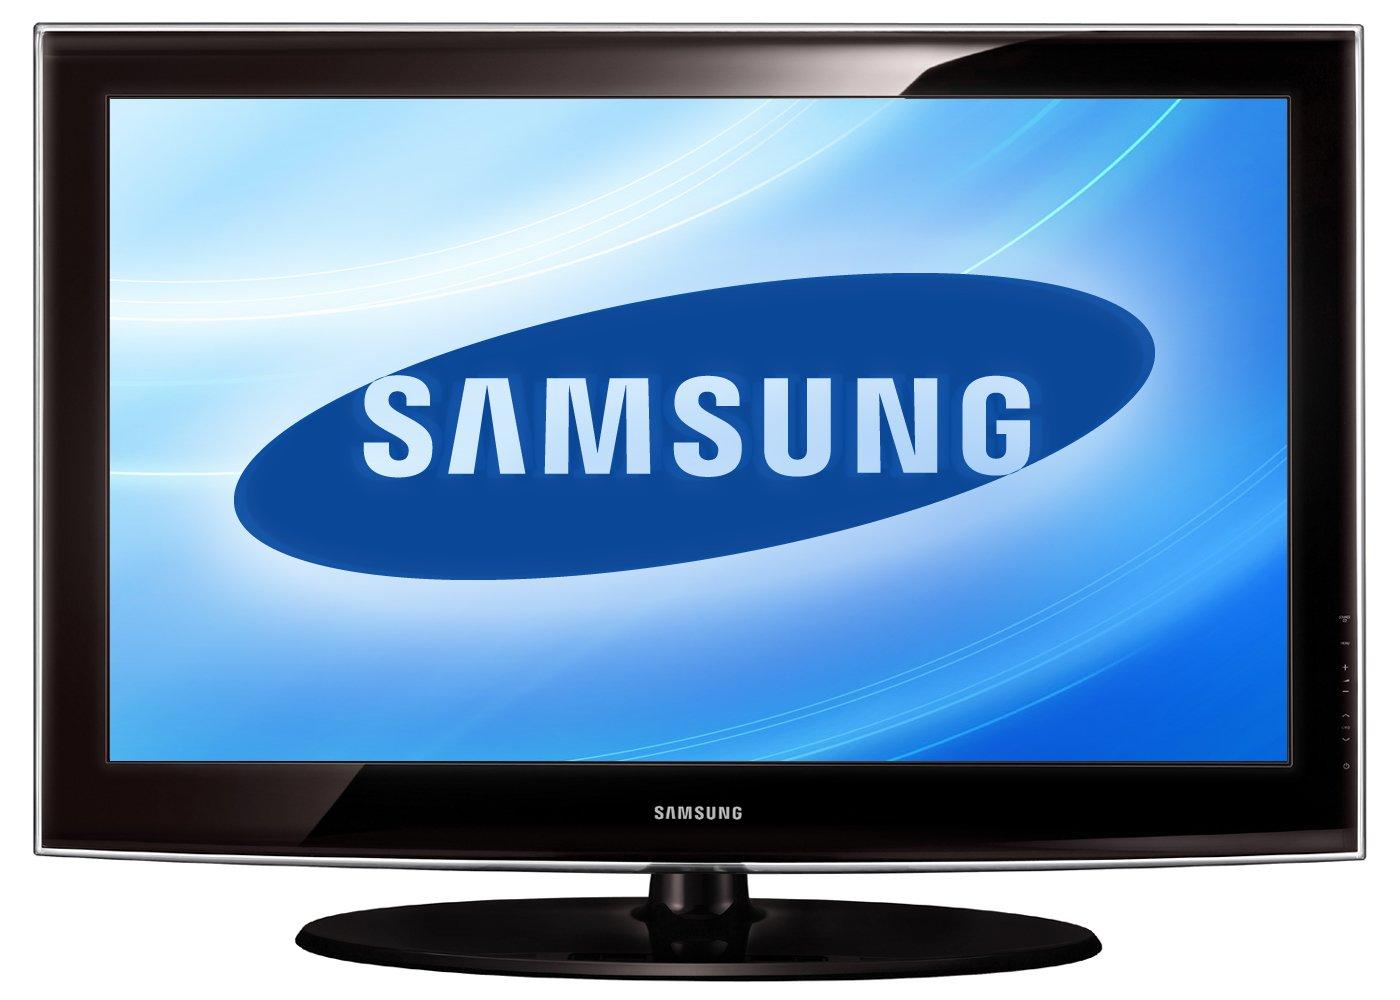 Samsung LE 40 A 615- Televisión Full HD, Pantalla LCD 40 pulgadas: Amazon.es: Electrónica